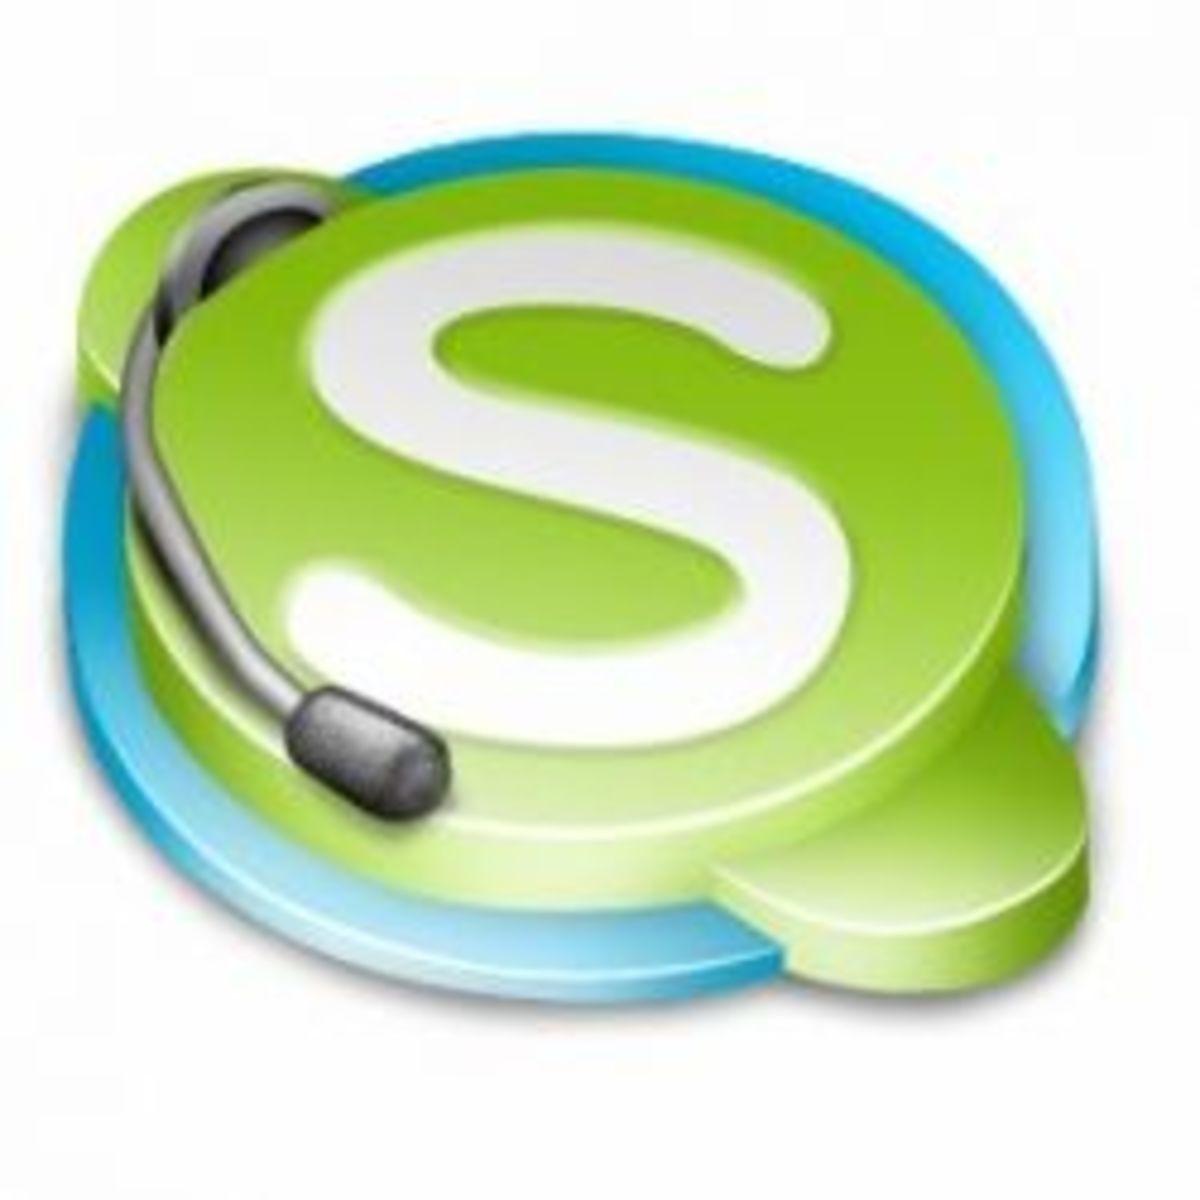 Skype on Android Mini PC